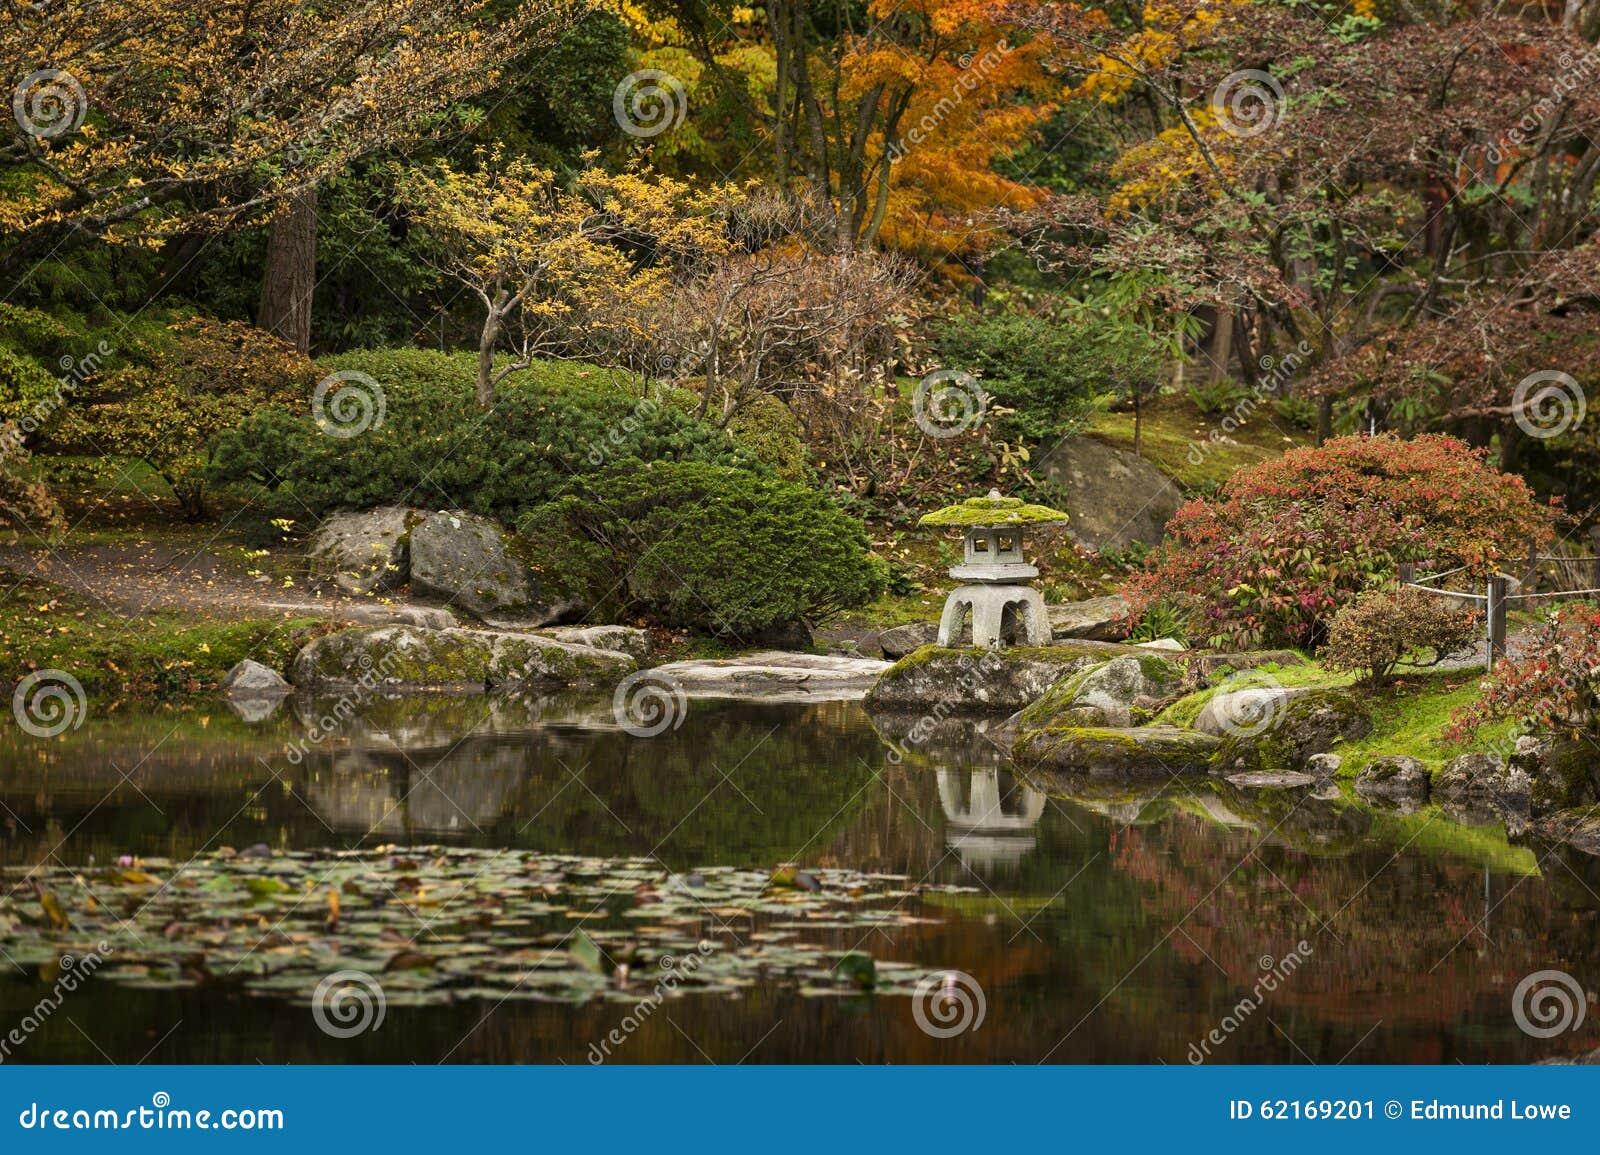 Japan Water Garden Pagoda. stock image. Image of pagoda - 62169201